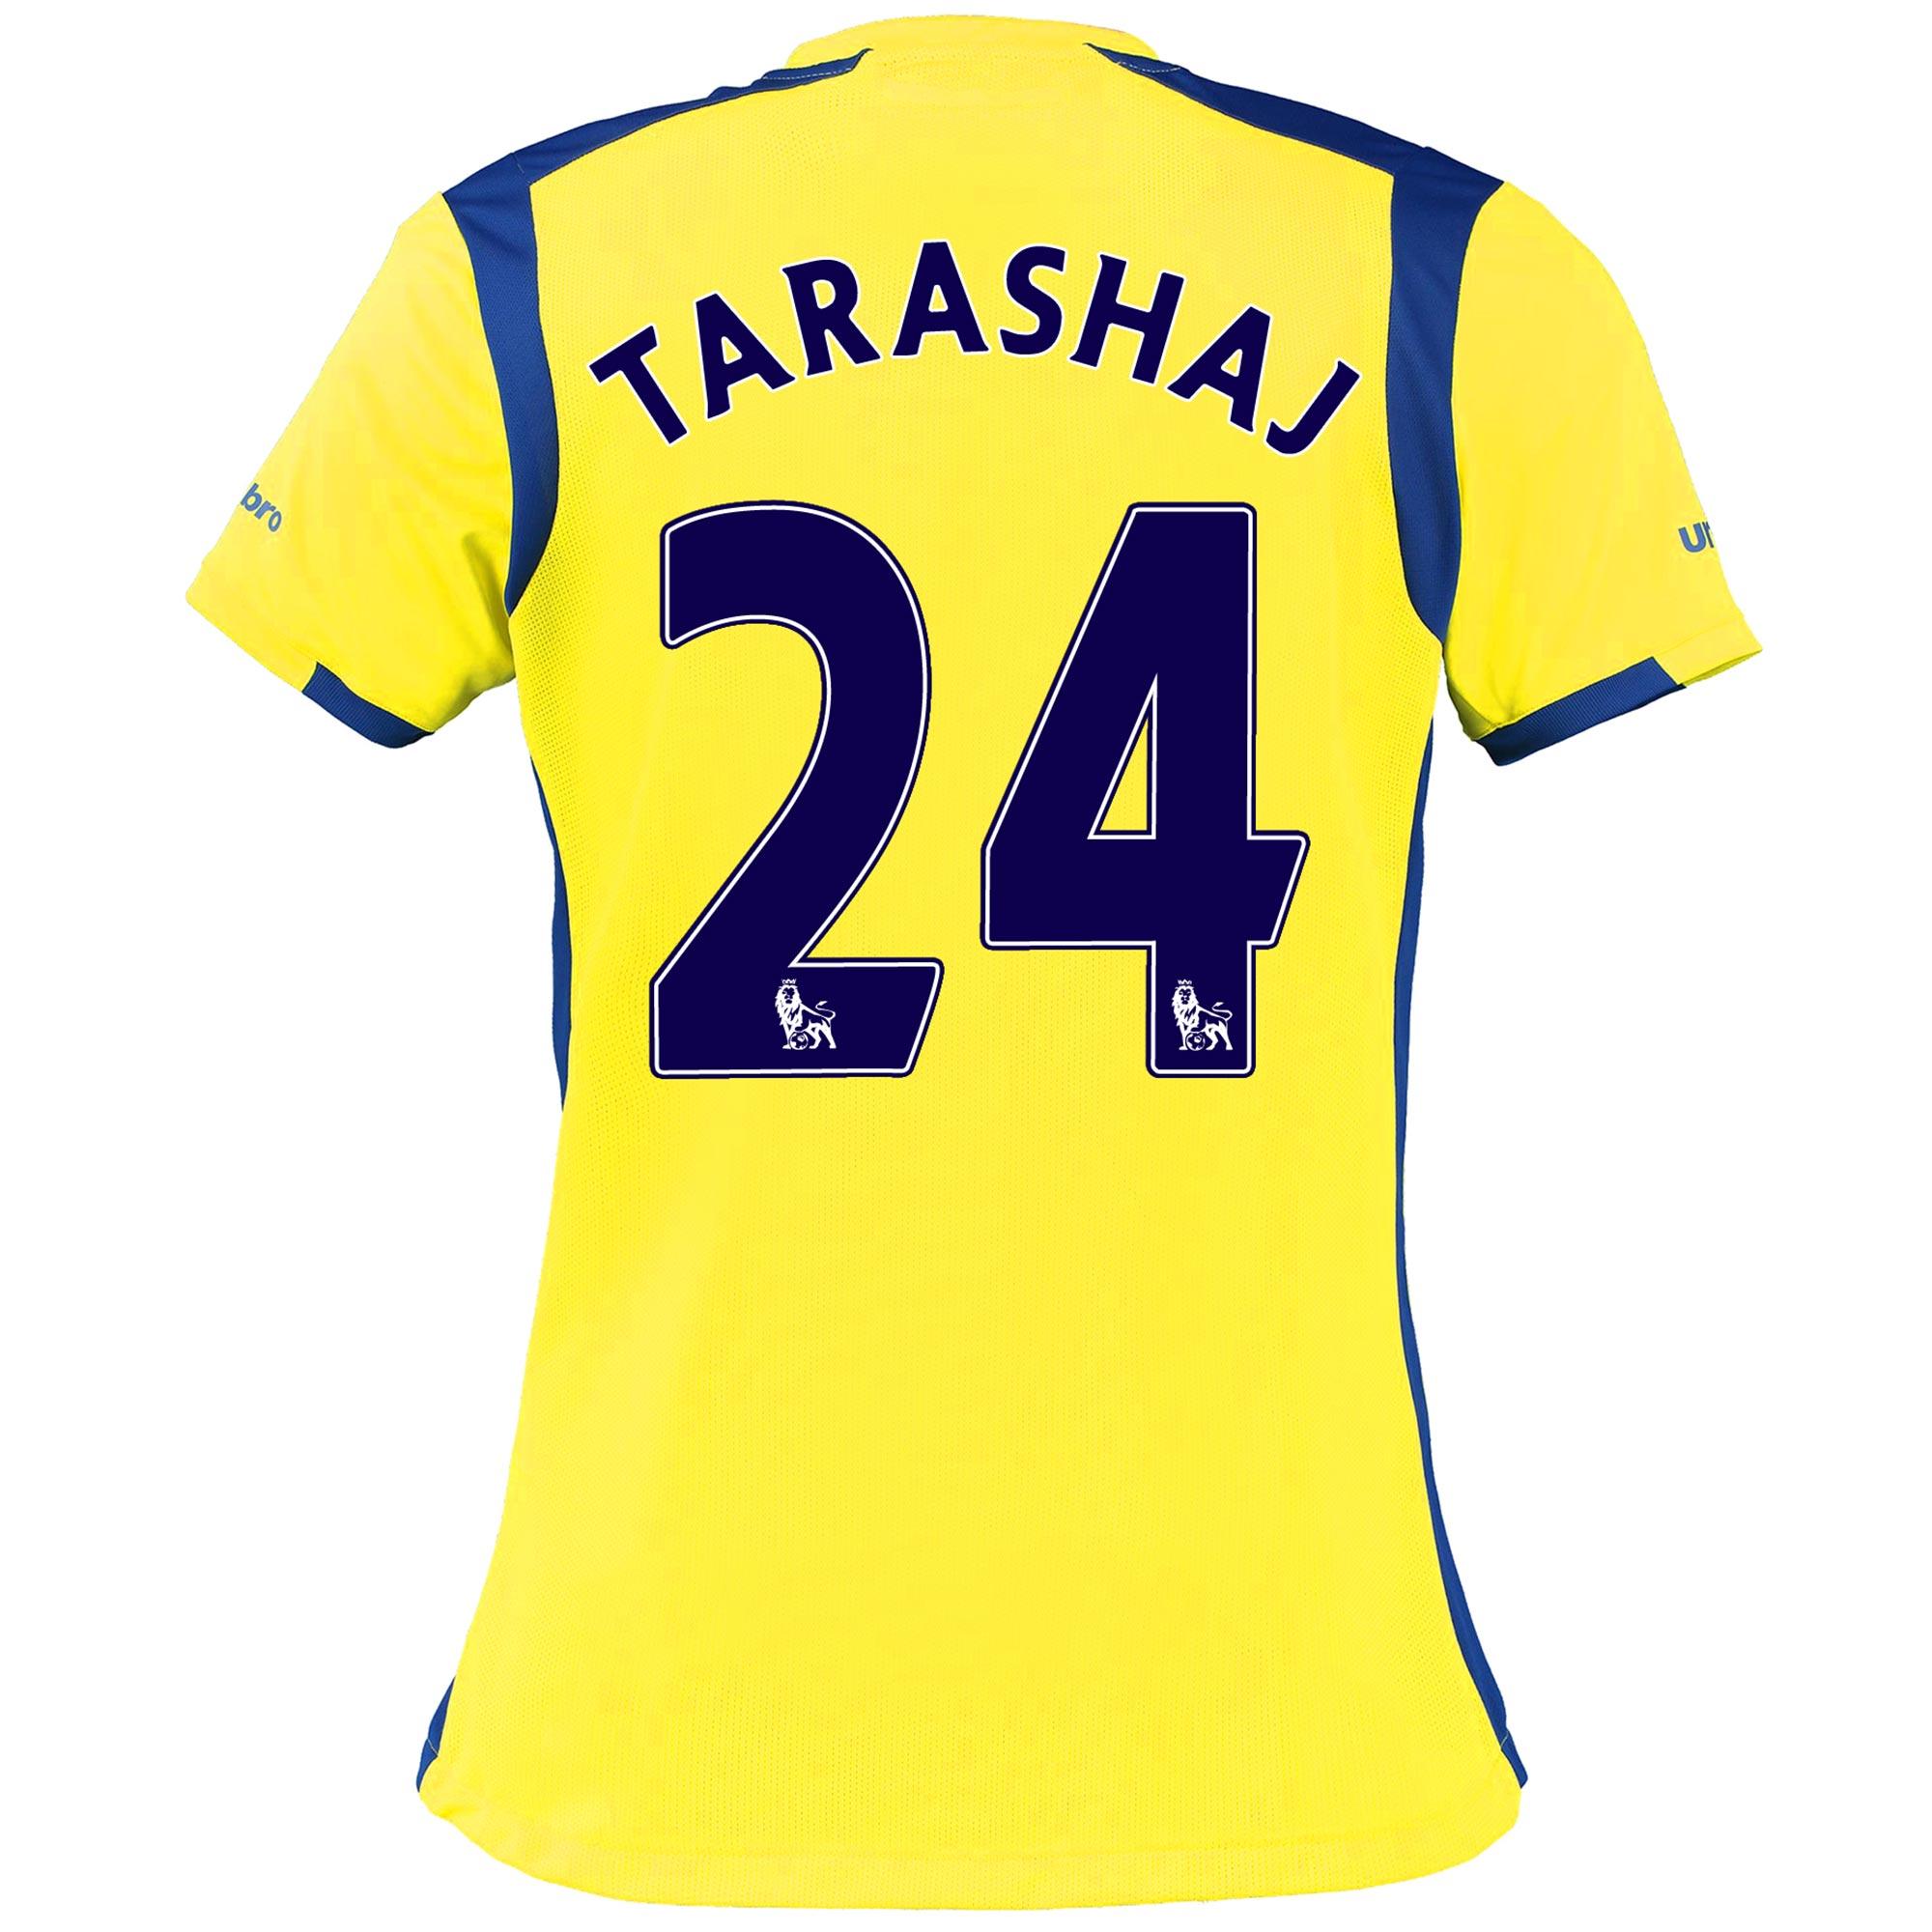 Everton 3rd Shirt 2016/17 - Womens with Tarashaj 24 printing